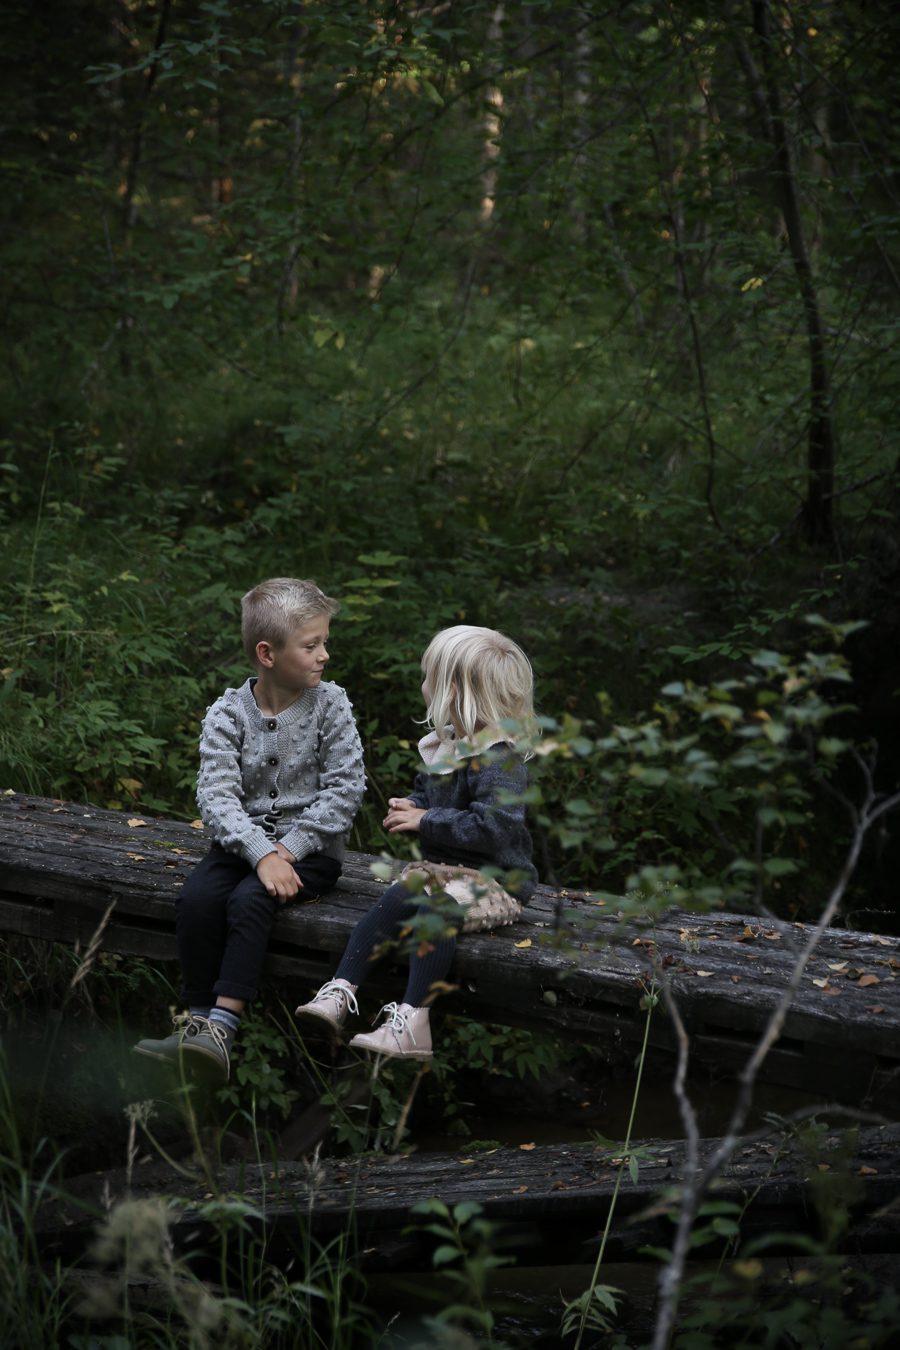 viktoria.holmgren.lovely.life.petit.nord.barnskor.barnklader